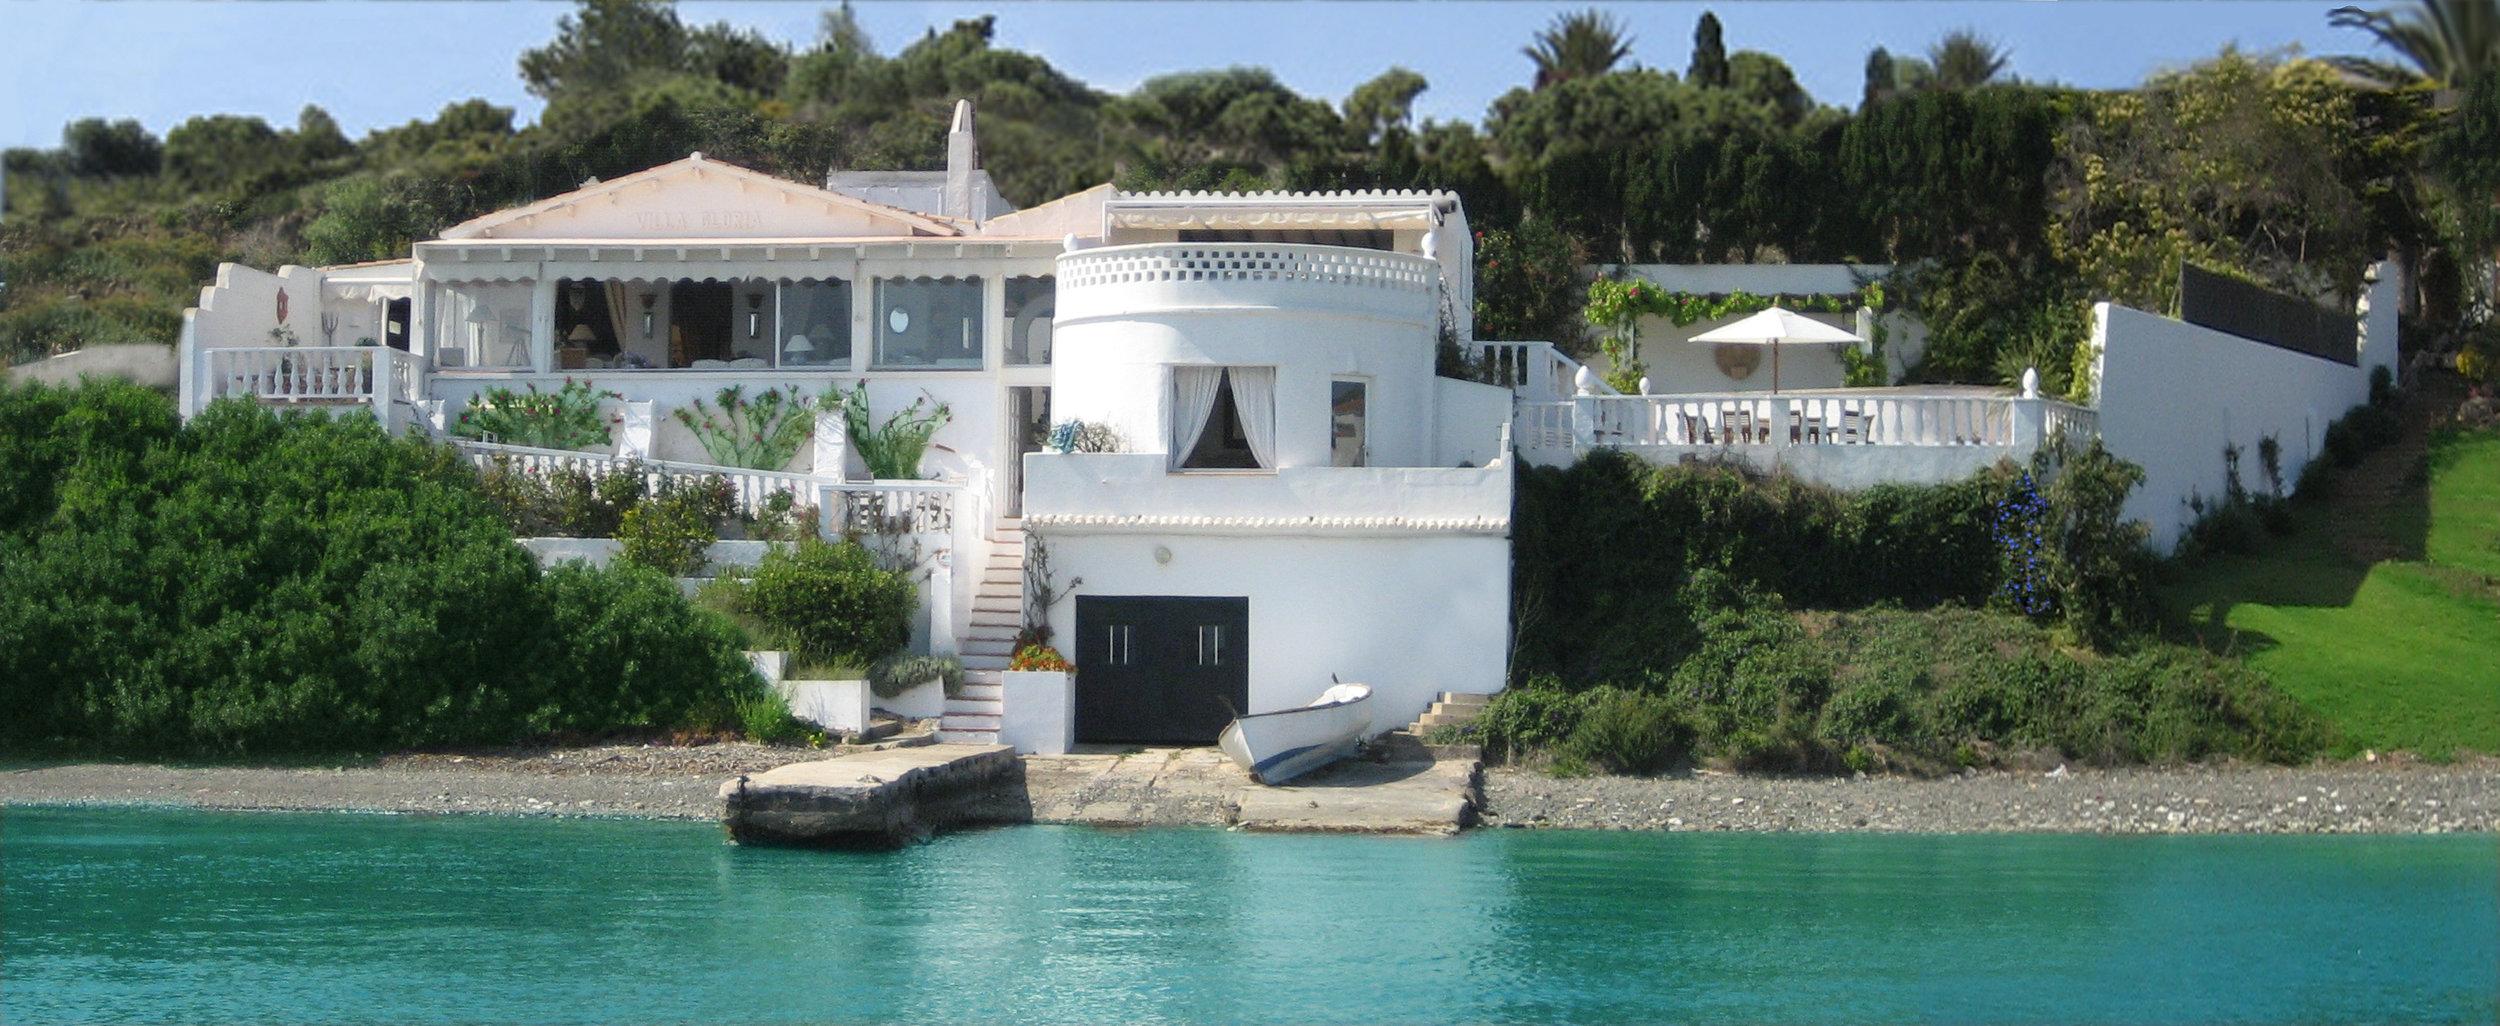 Menorca house 2014.jpg